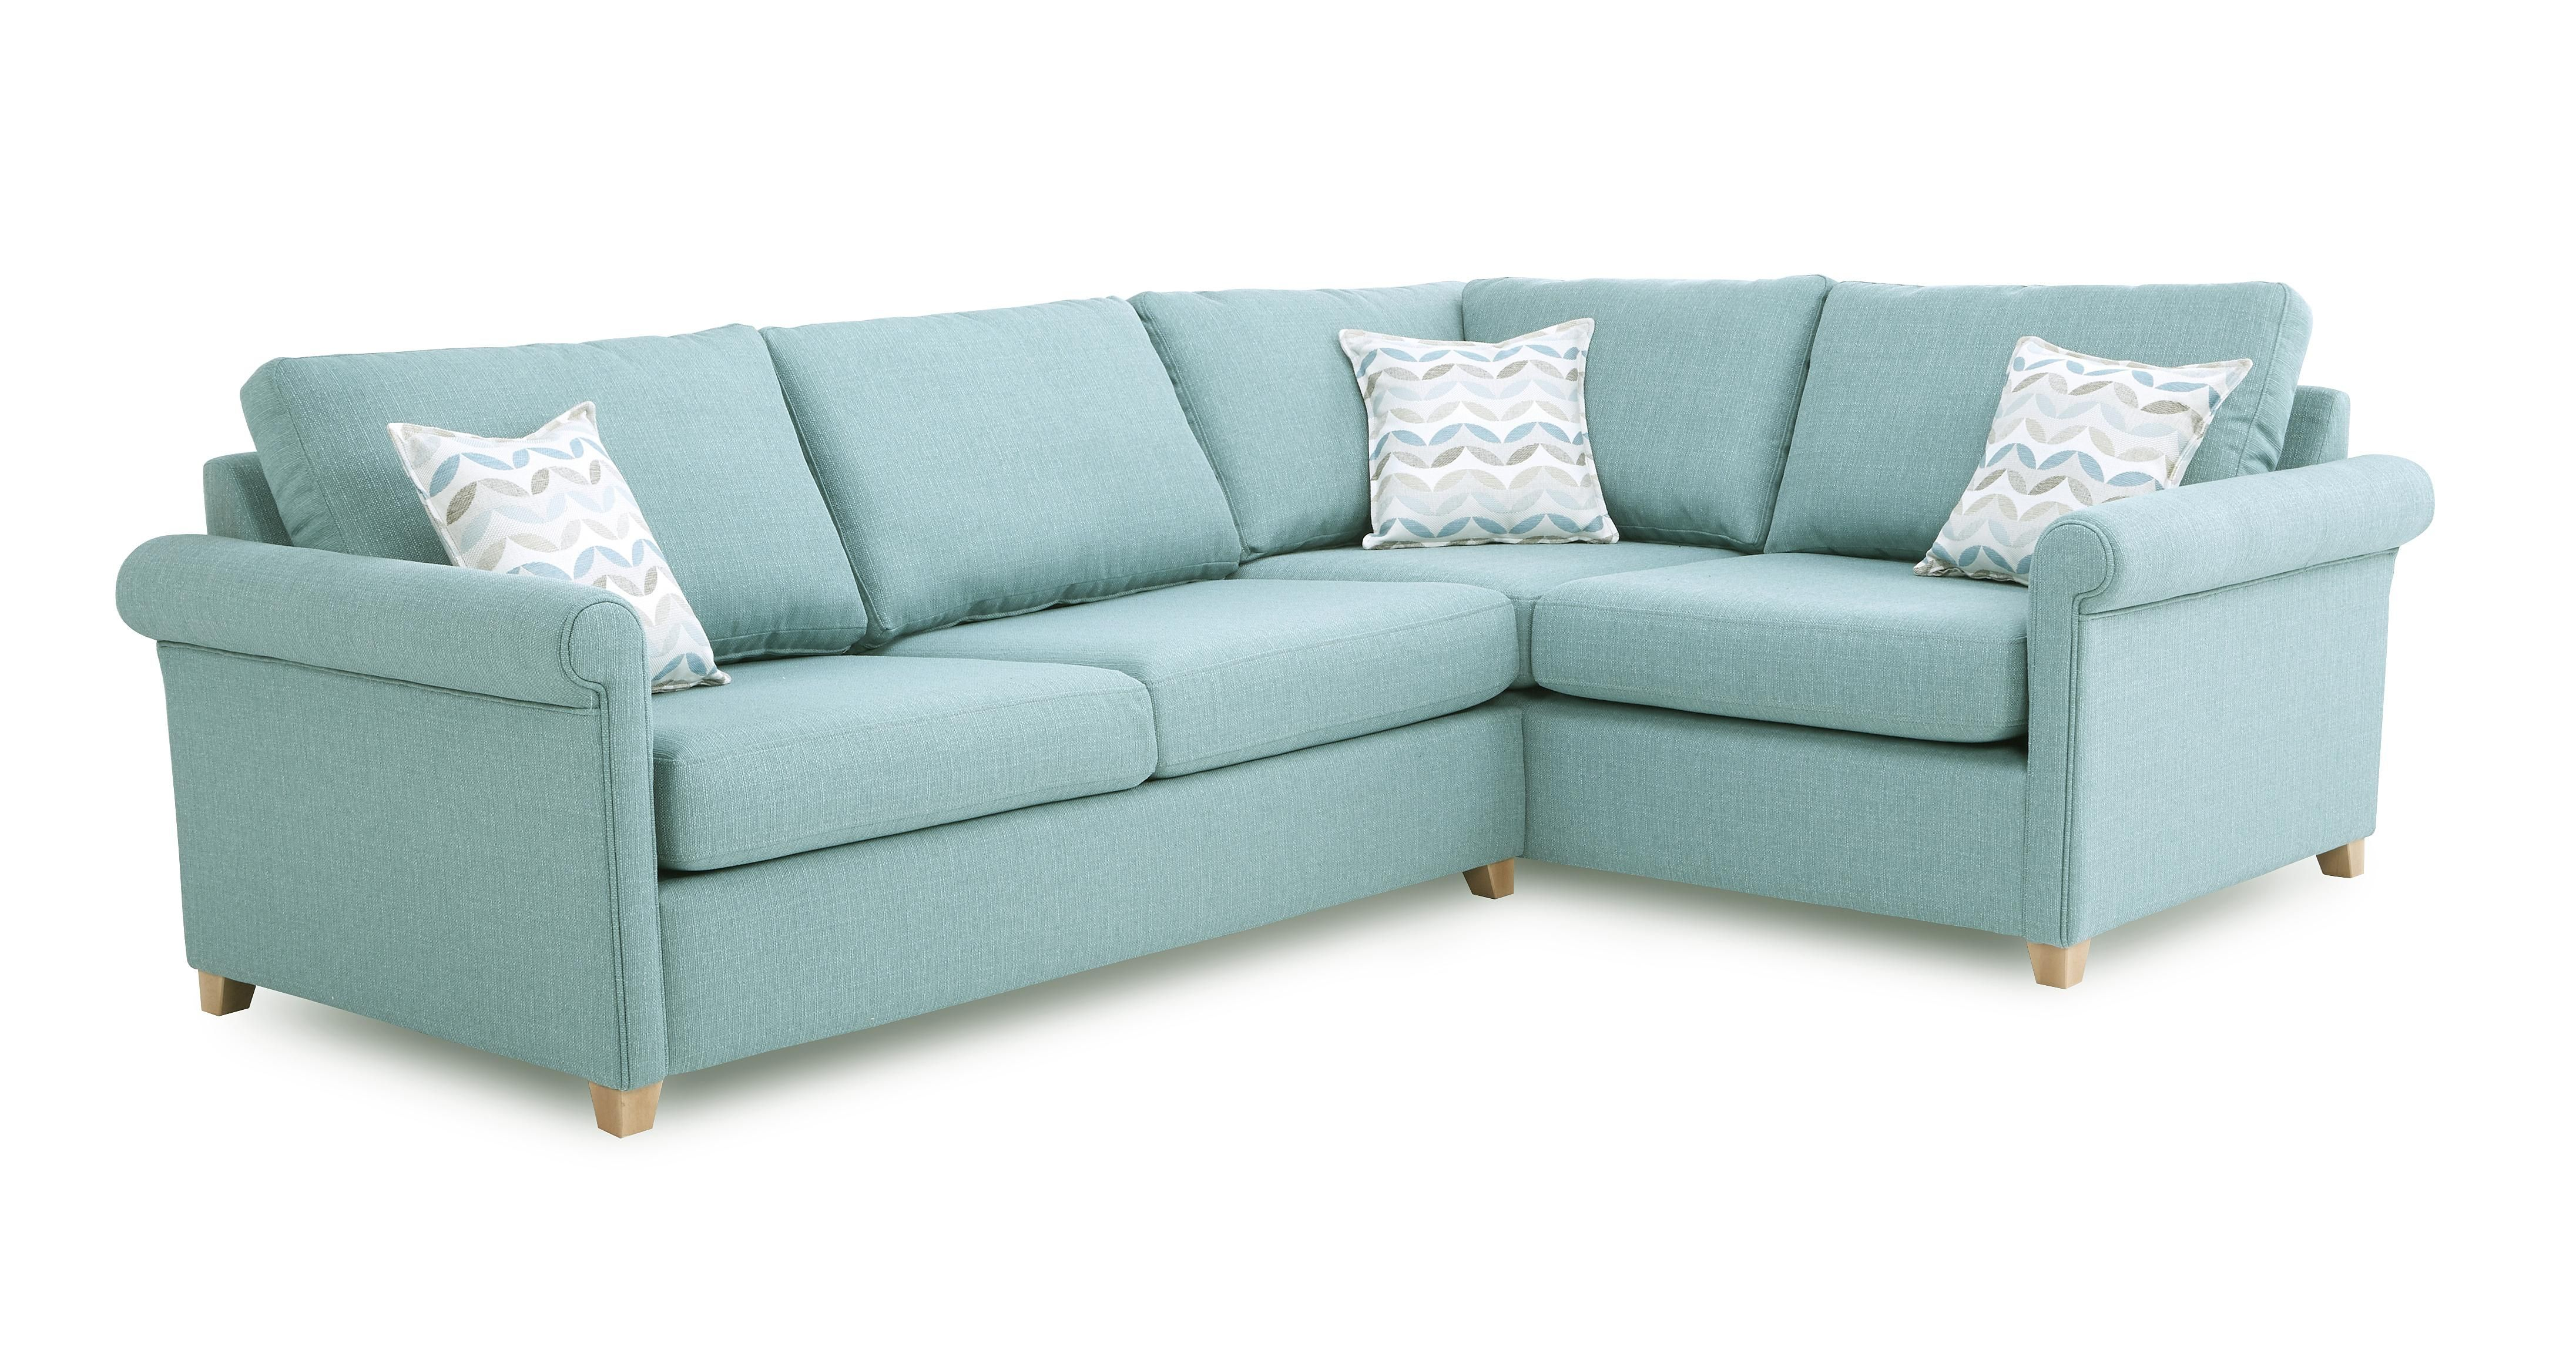 anya_zc_anya_turquoise_view2 (4384×2327) Corner sofa bed